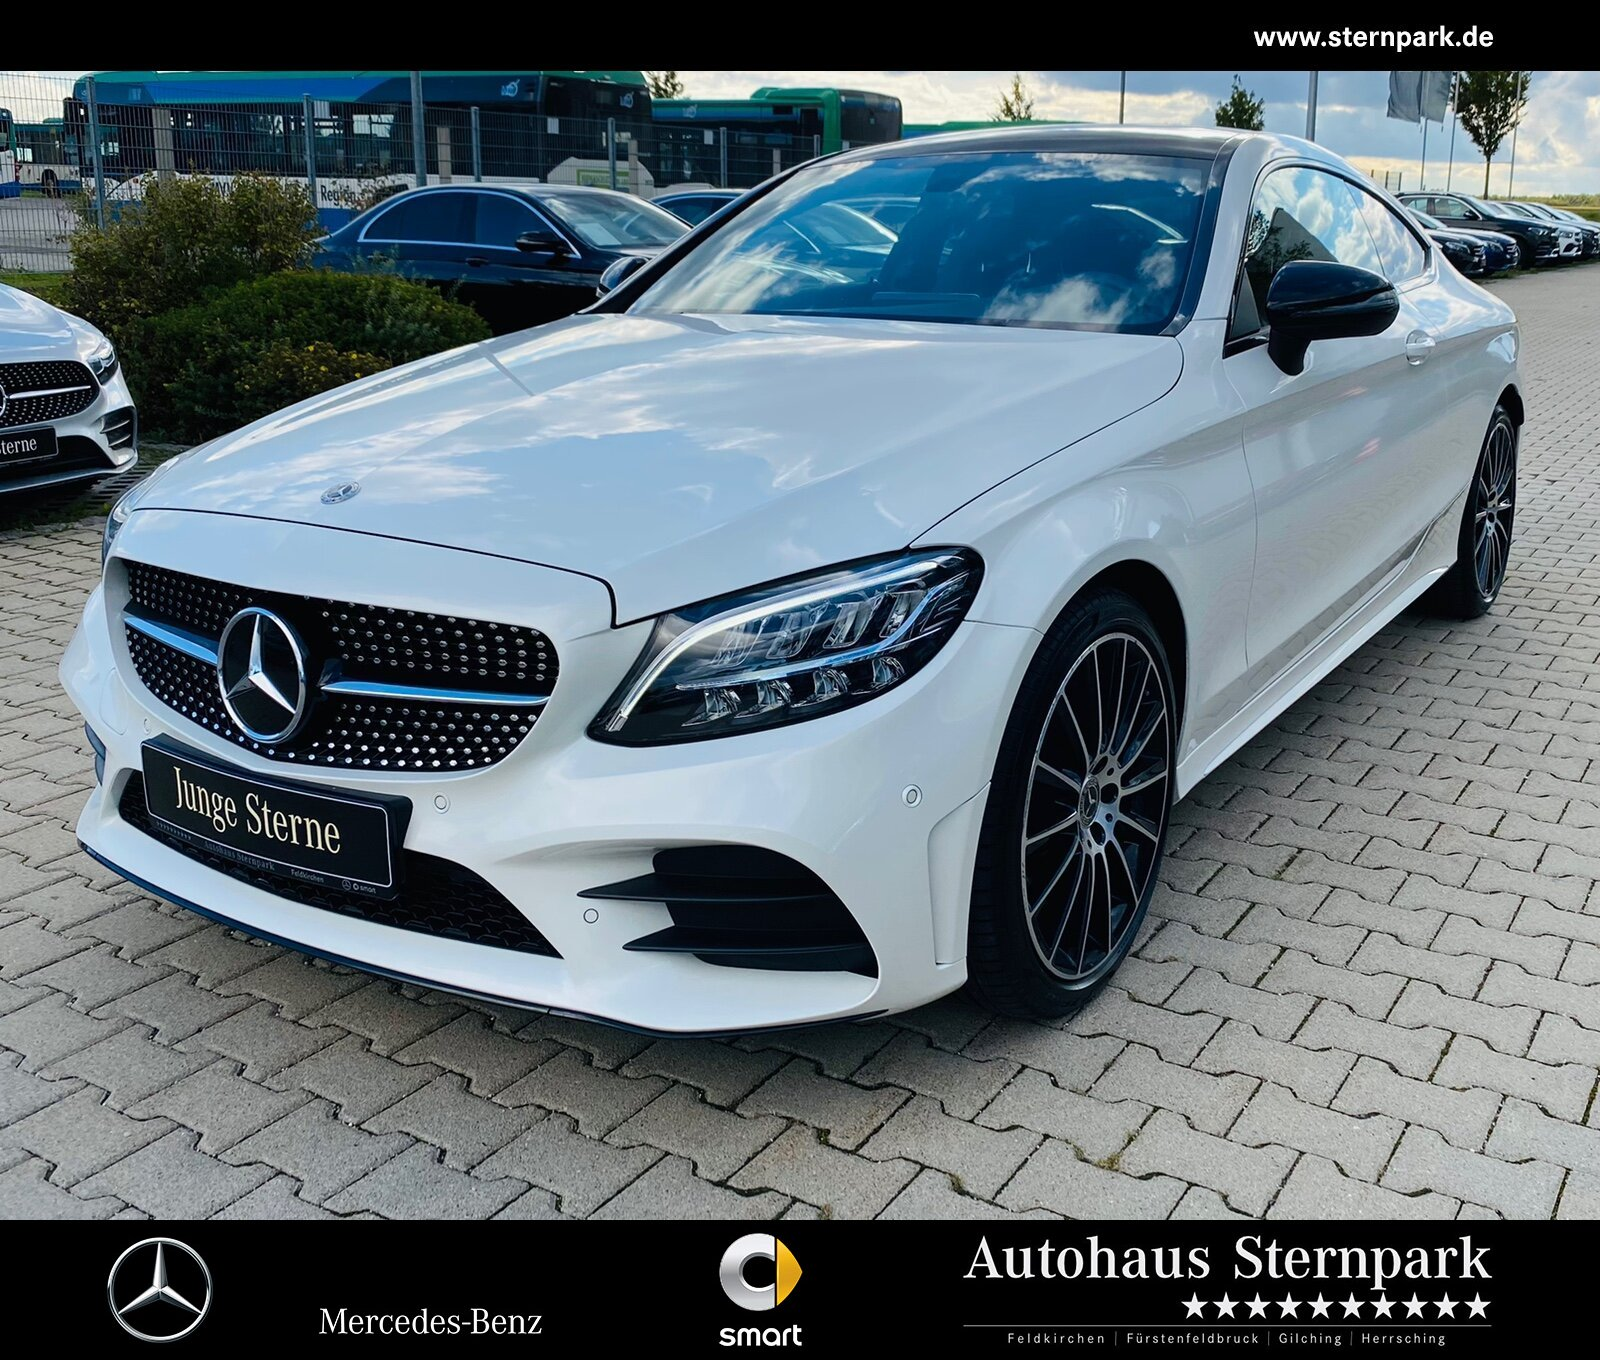 Mercedes-Benz C 200 Coupé AMG Navi+PANO+NIGHT+LED+BURMESTER+, Jahr 2020, Benzin